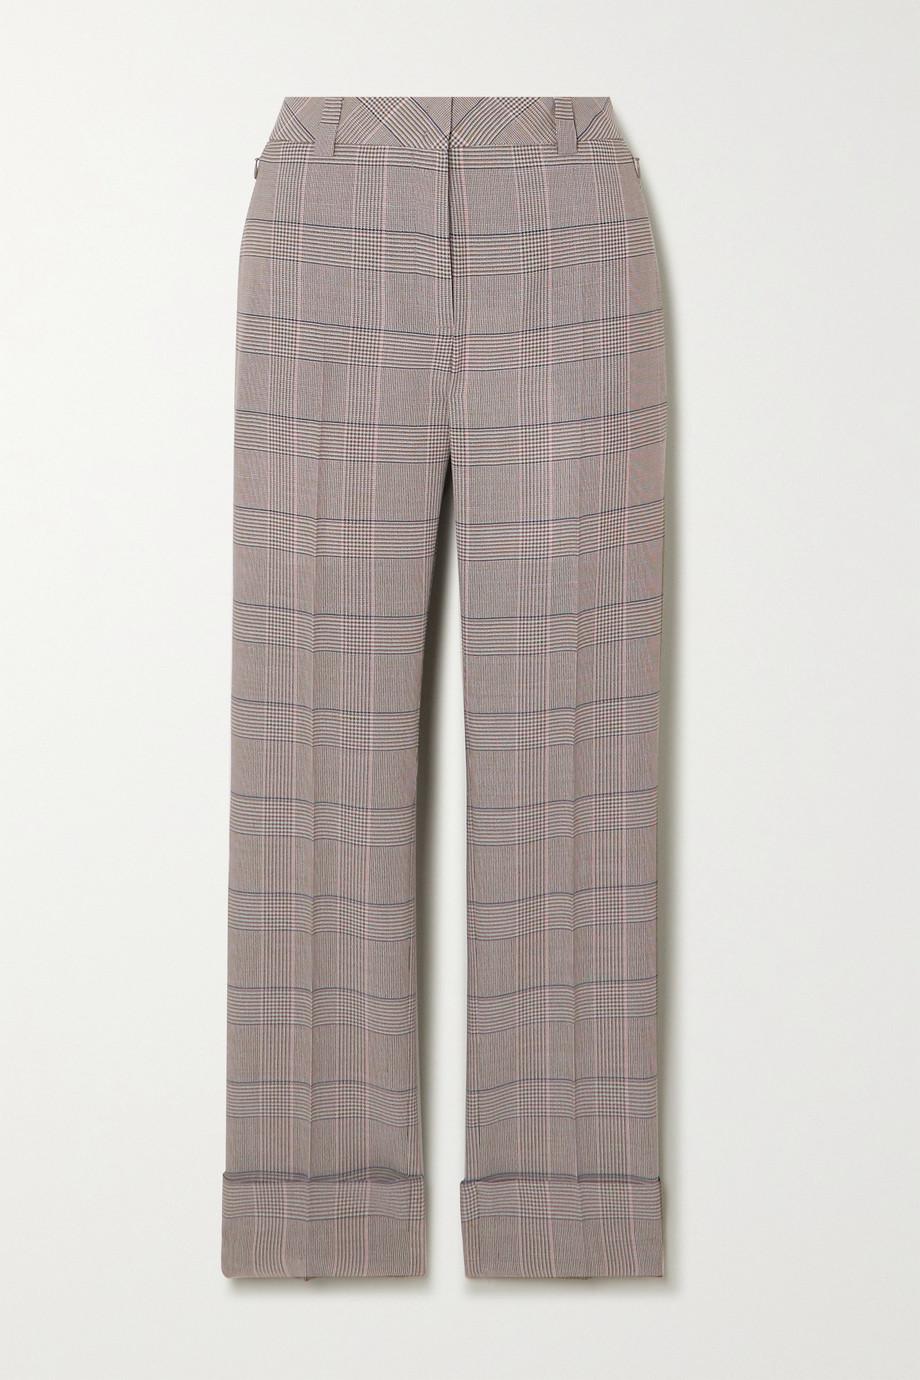 Akris Maxima checked wool straight-leg pants